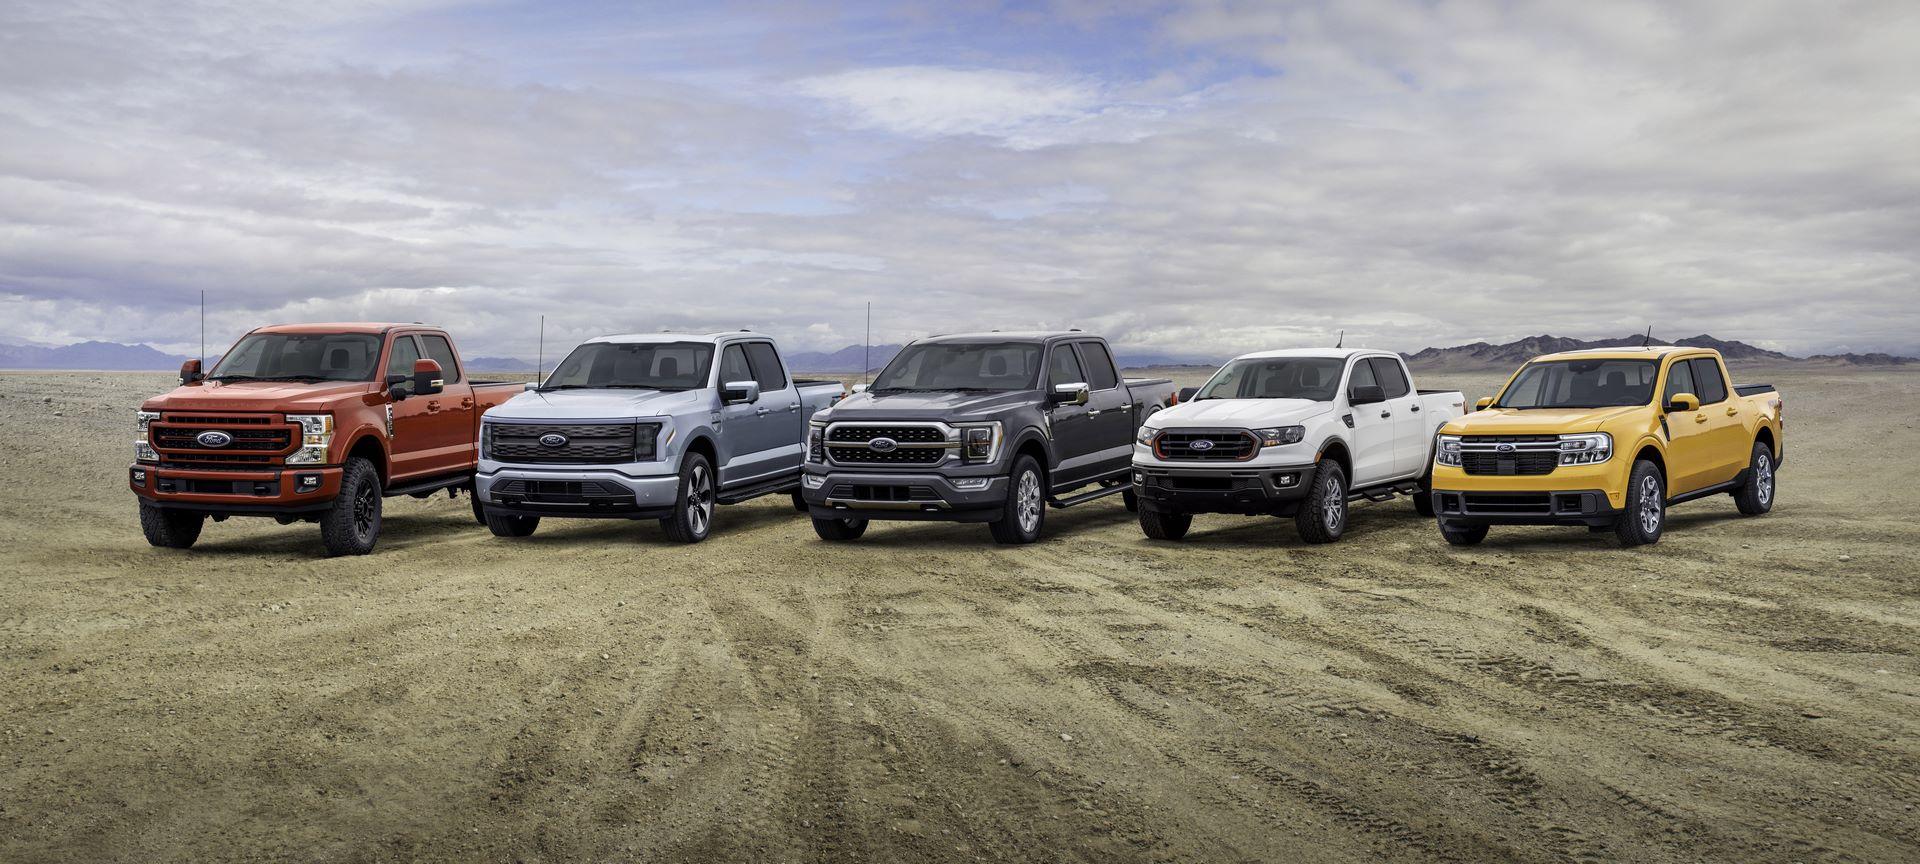 Built Ford Tough Truck Lineup